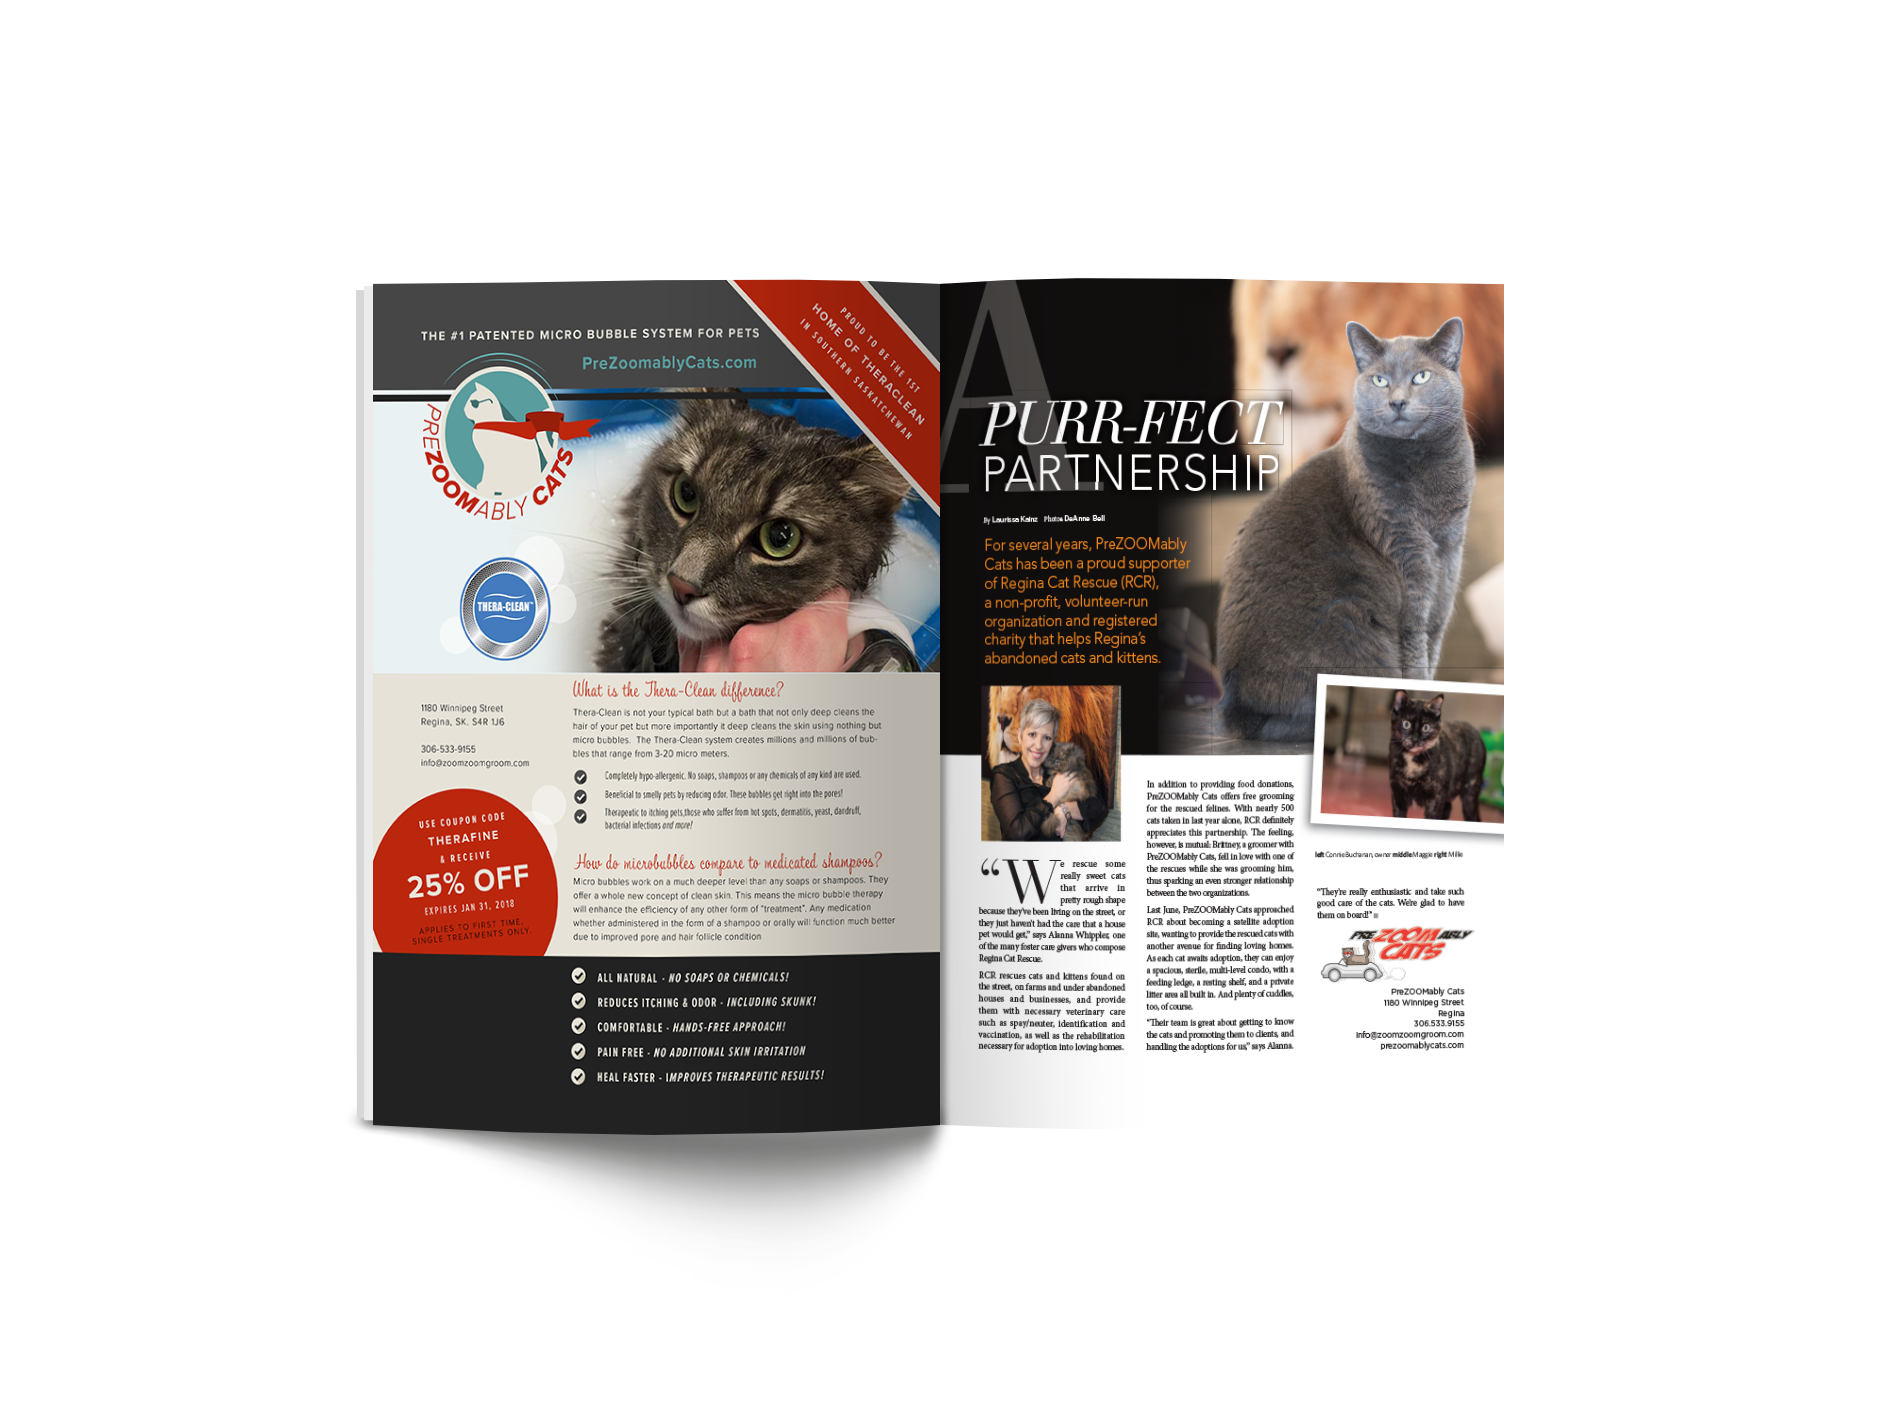 Purr-fect Partnership: PreZoomably Cats Regina